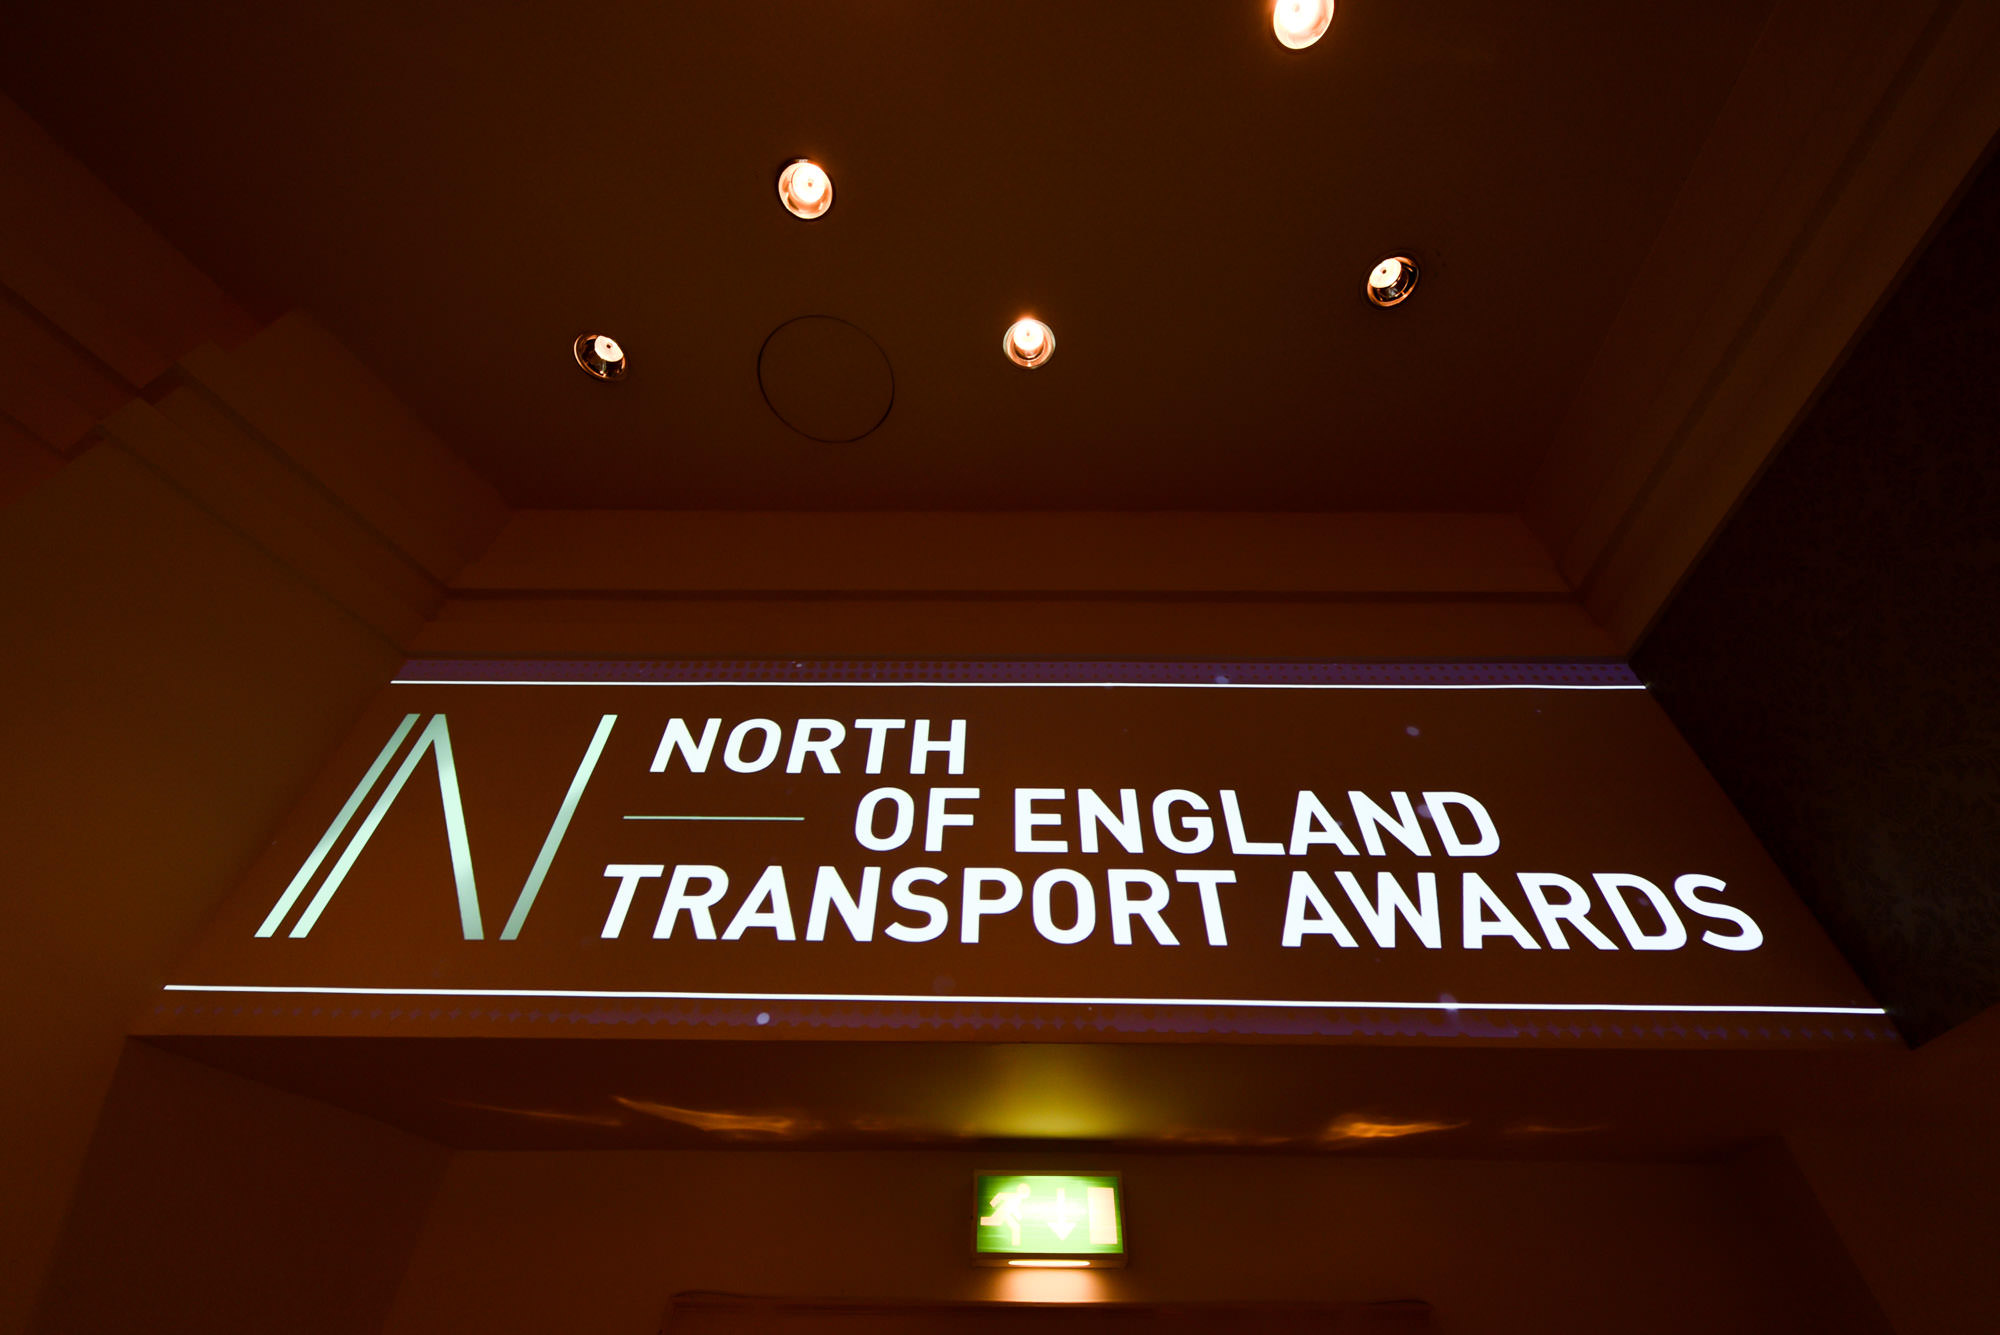 NorthOfEngland_TransportAwards_1.jpg